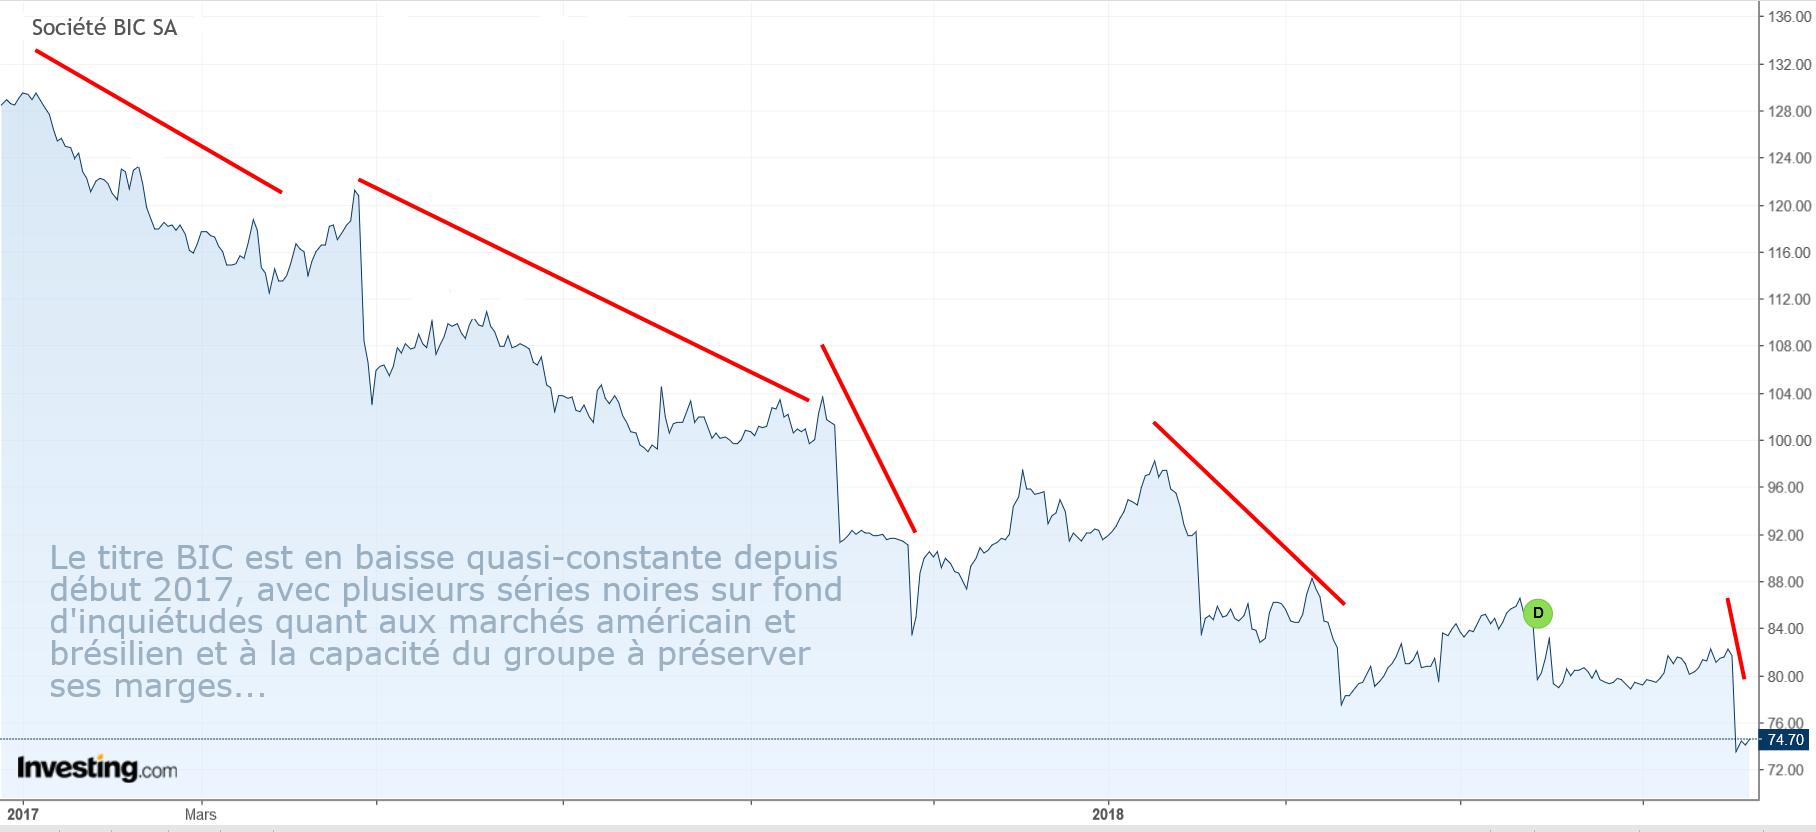 graph BIC SA